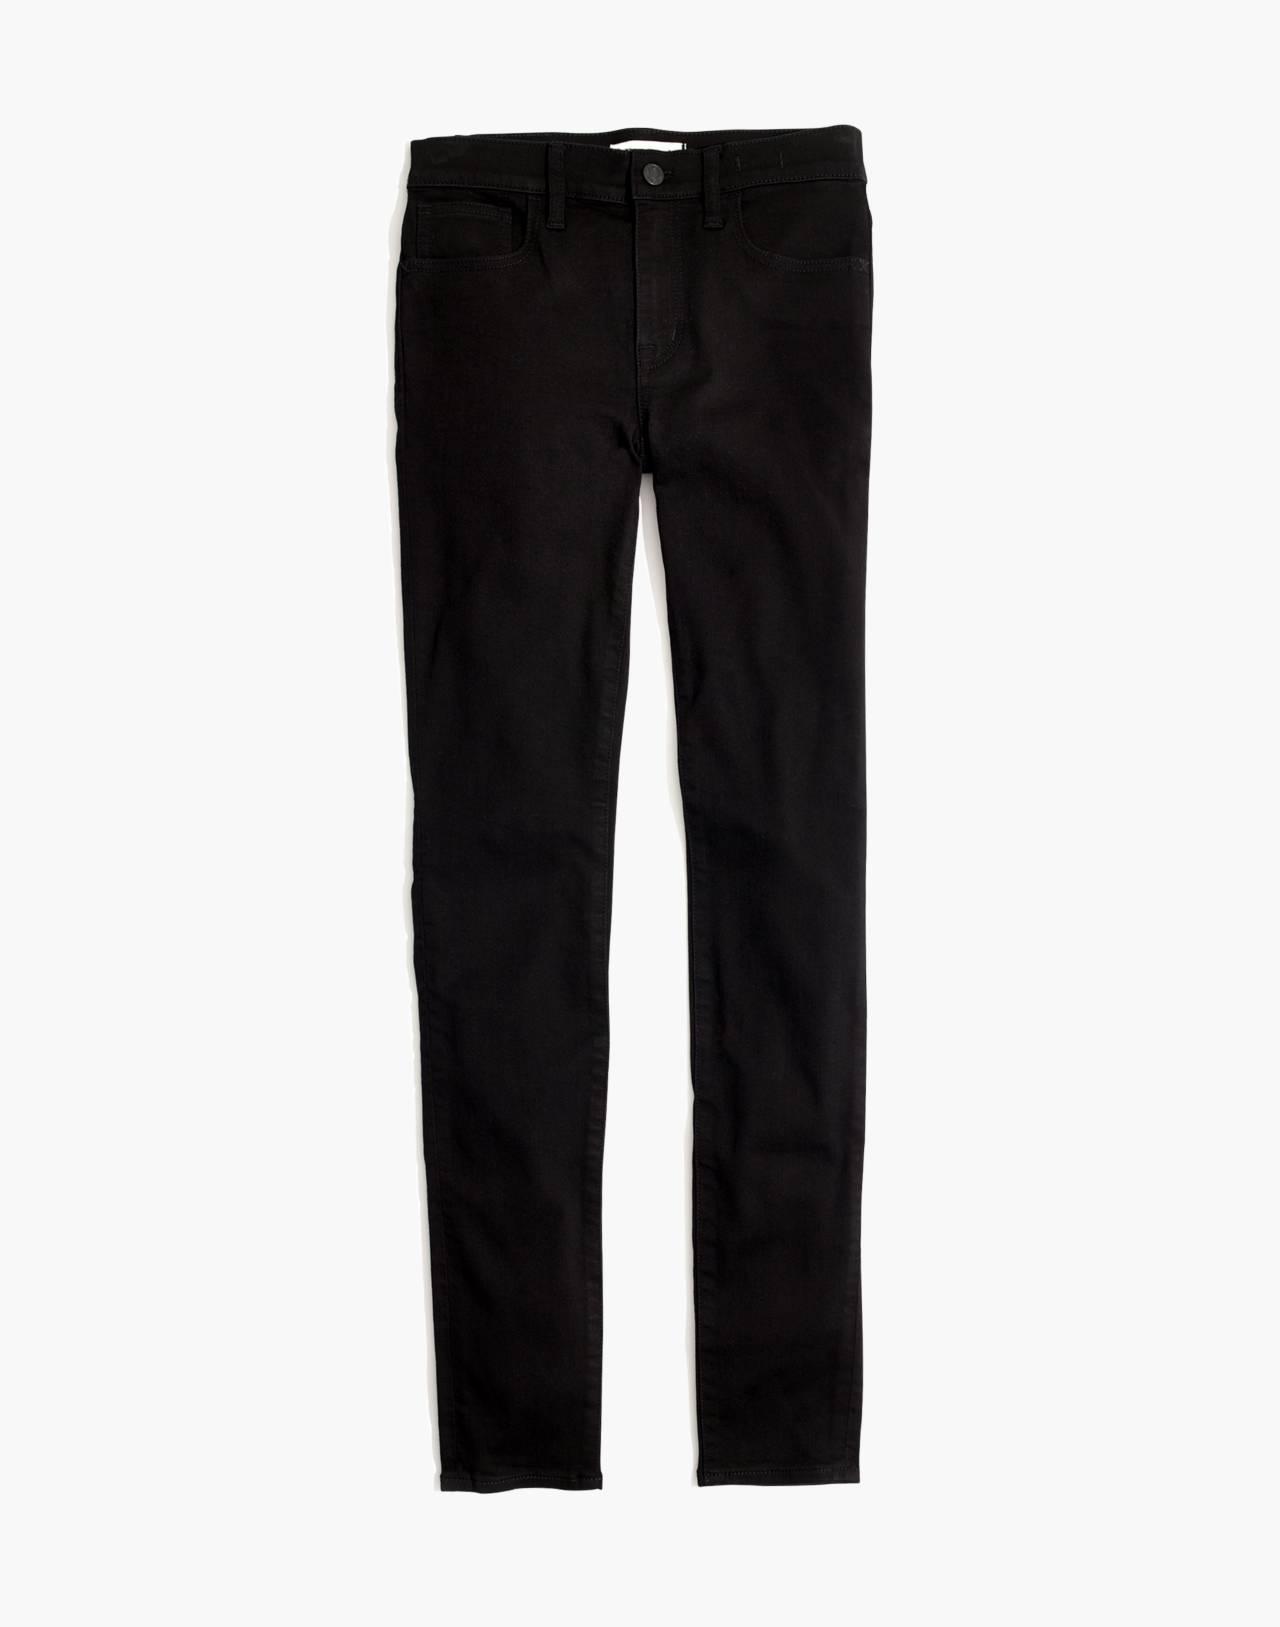 Petite Roadtripper Jeans in Bennett Black in bennett wash image 4